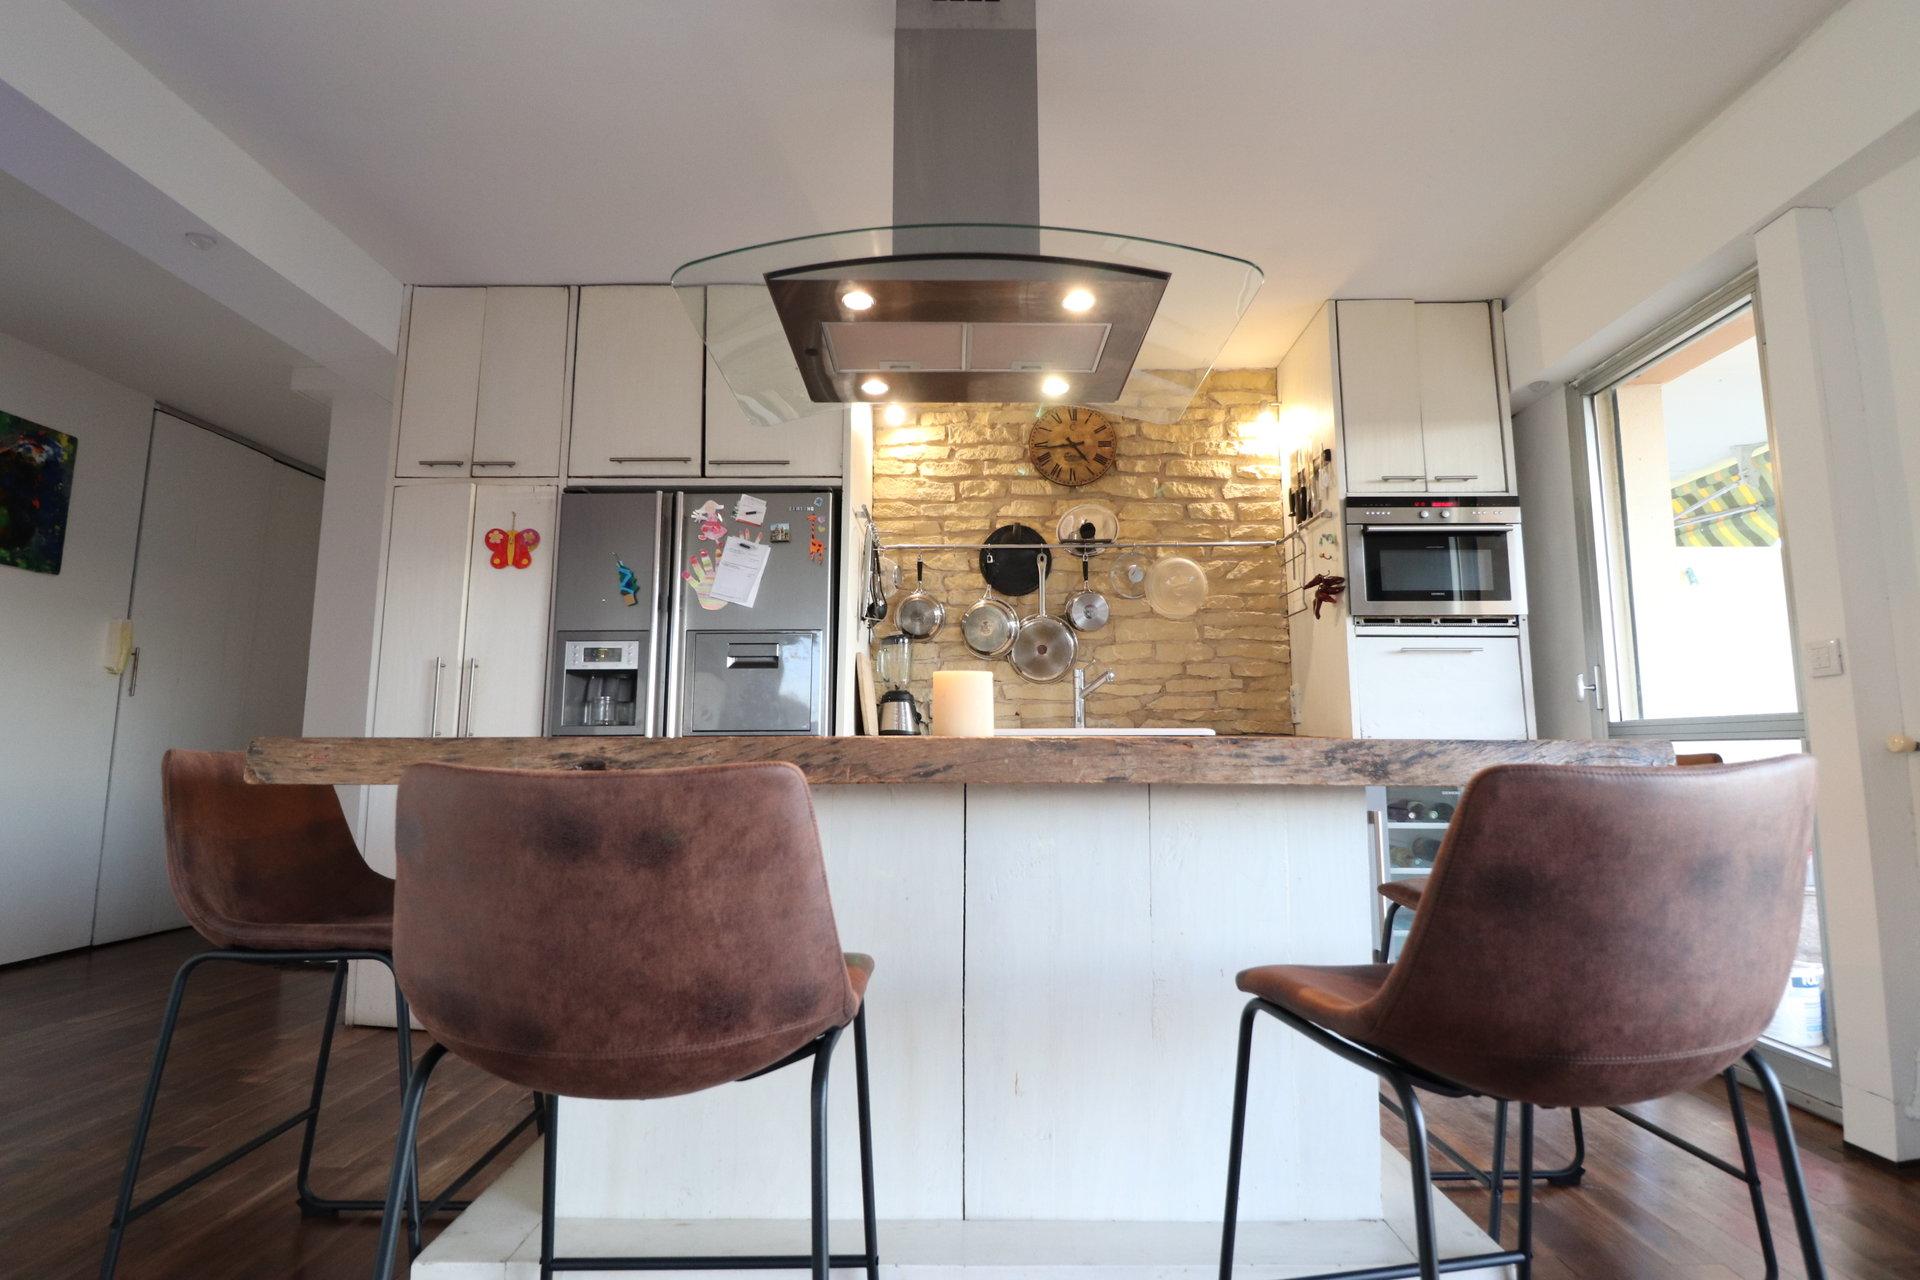 Кухонный бар, нержавеющая сталь